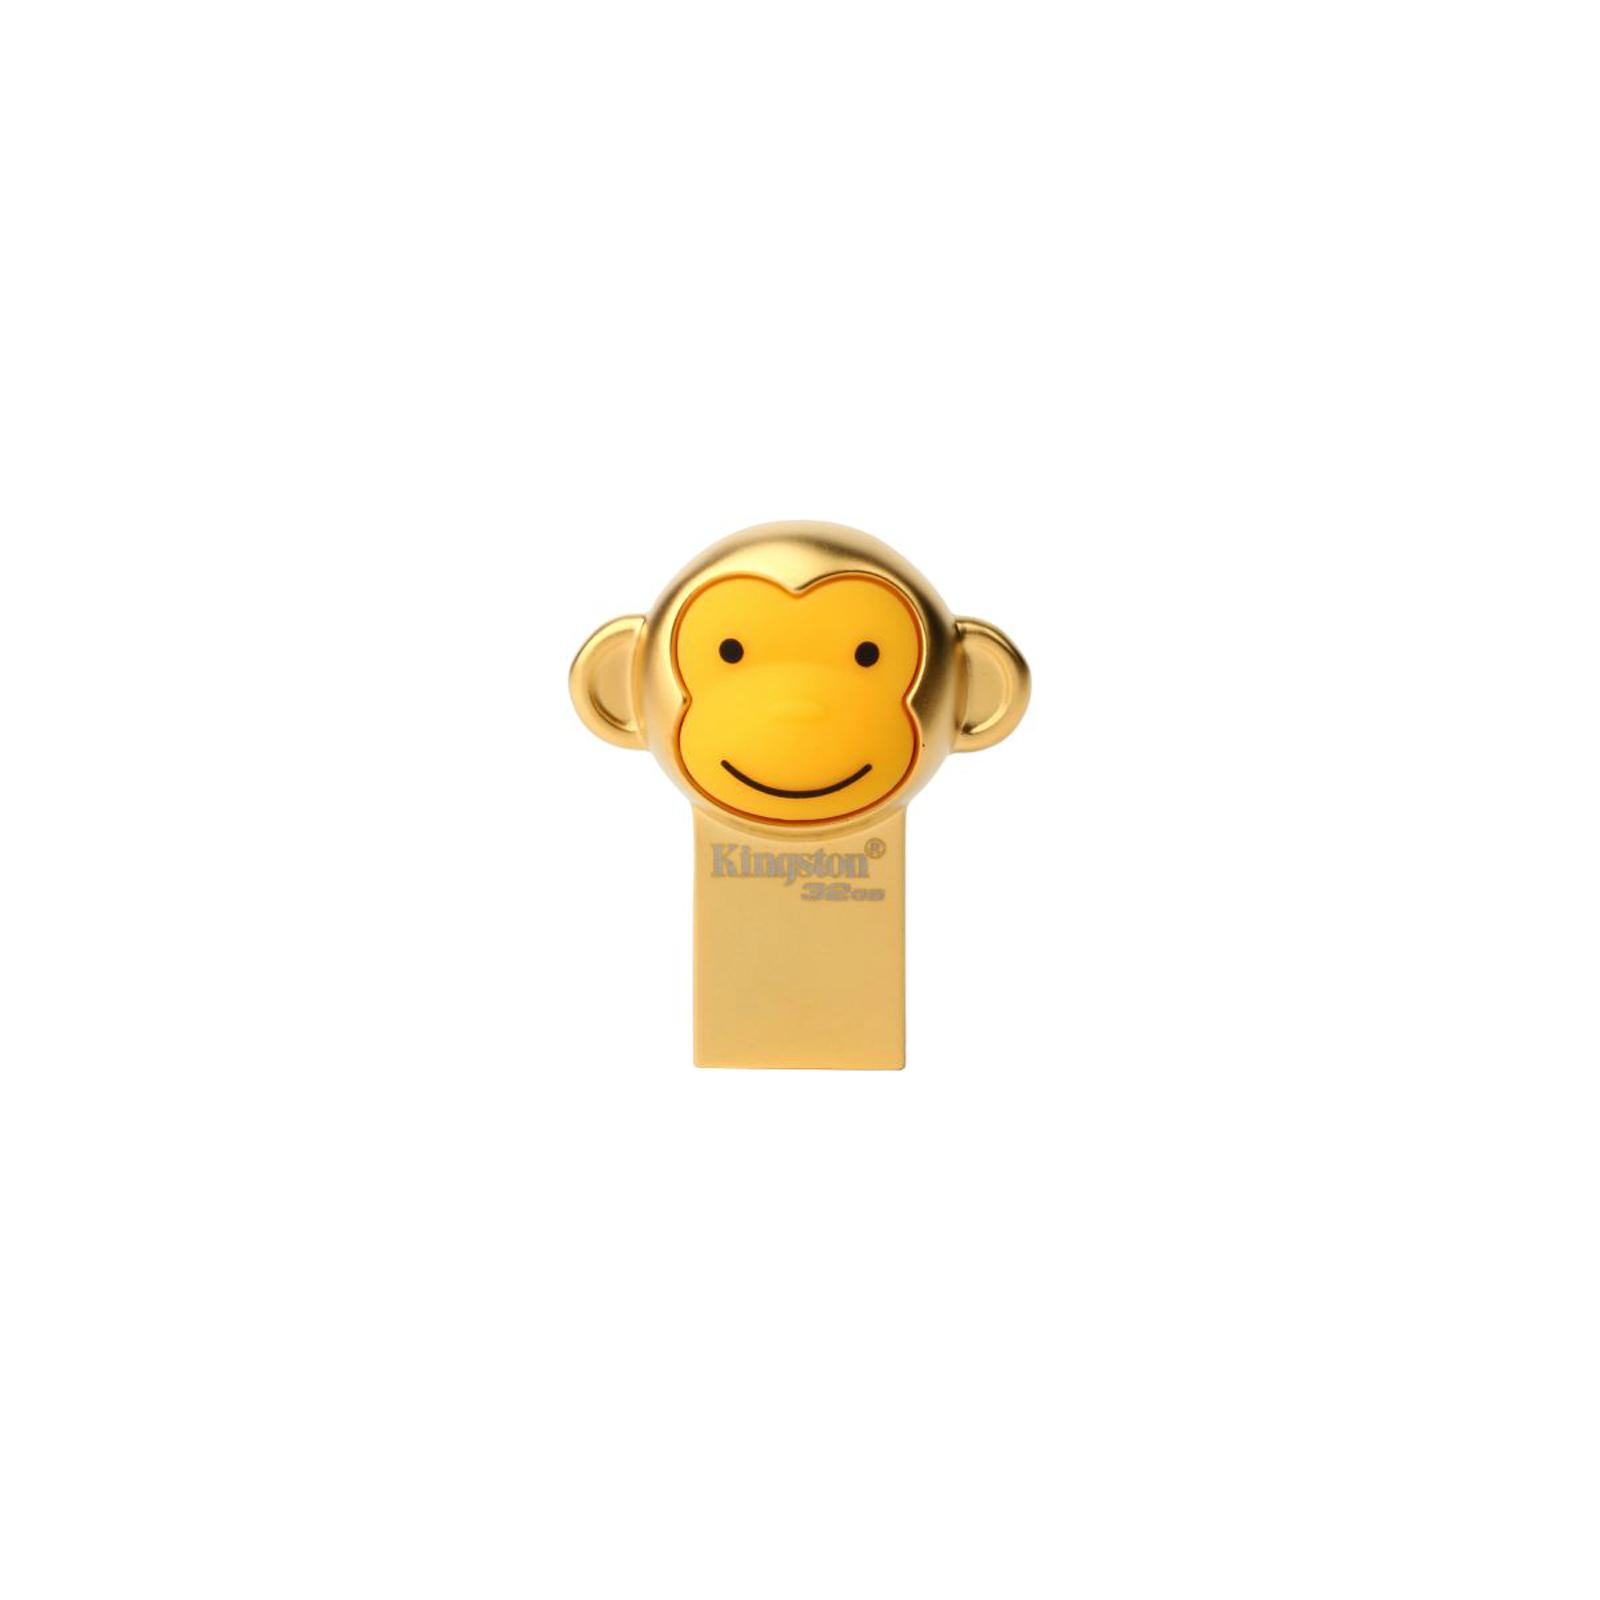 USB флеш накопитель Kingston 32GB Year of Monkey USB3.0/3.1 (DTCNY16/32GB)